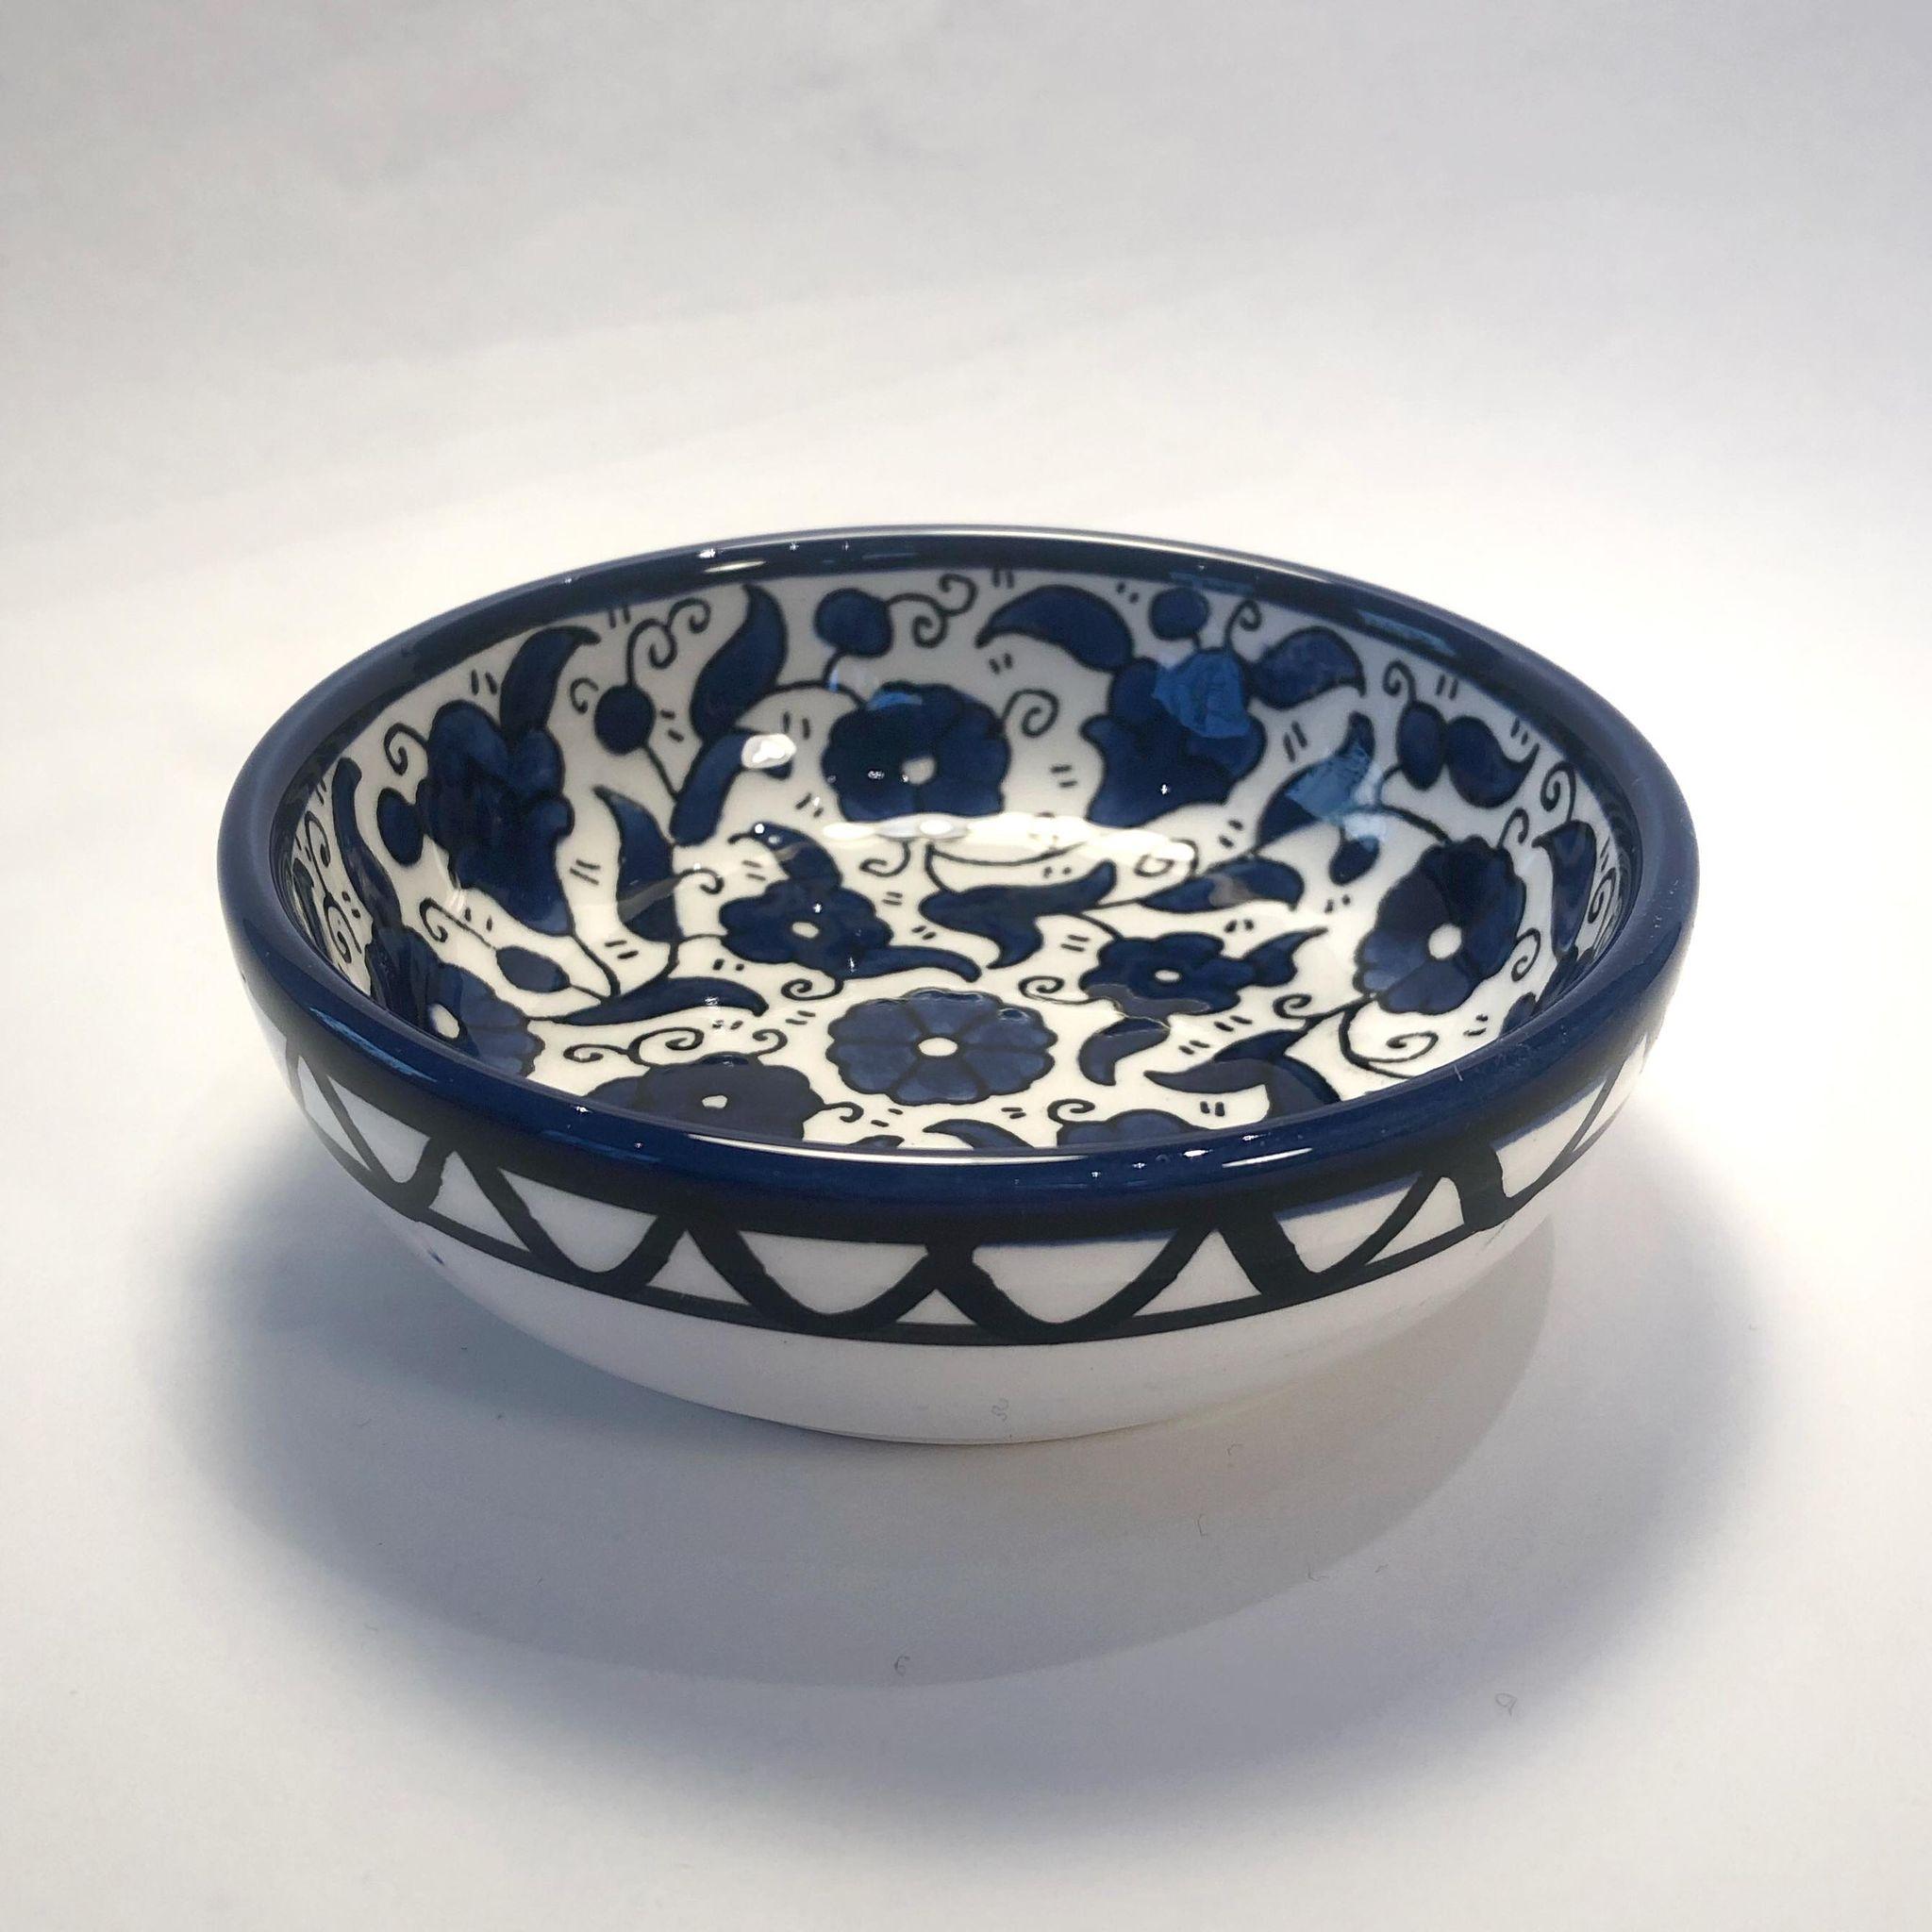 Liten keramikkskål, blå